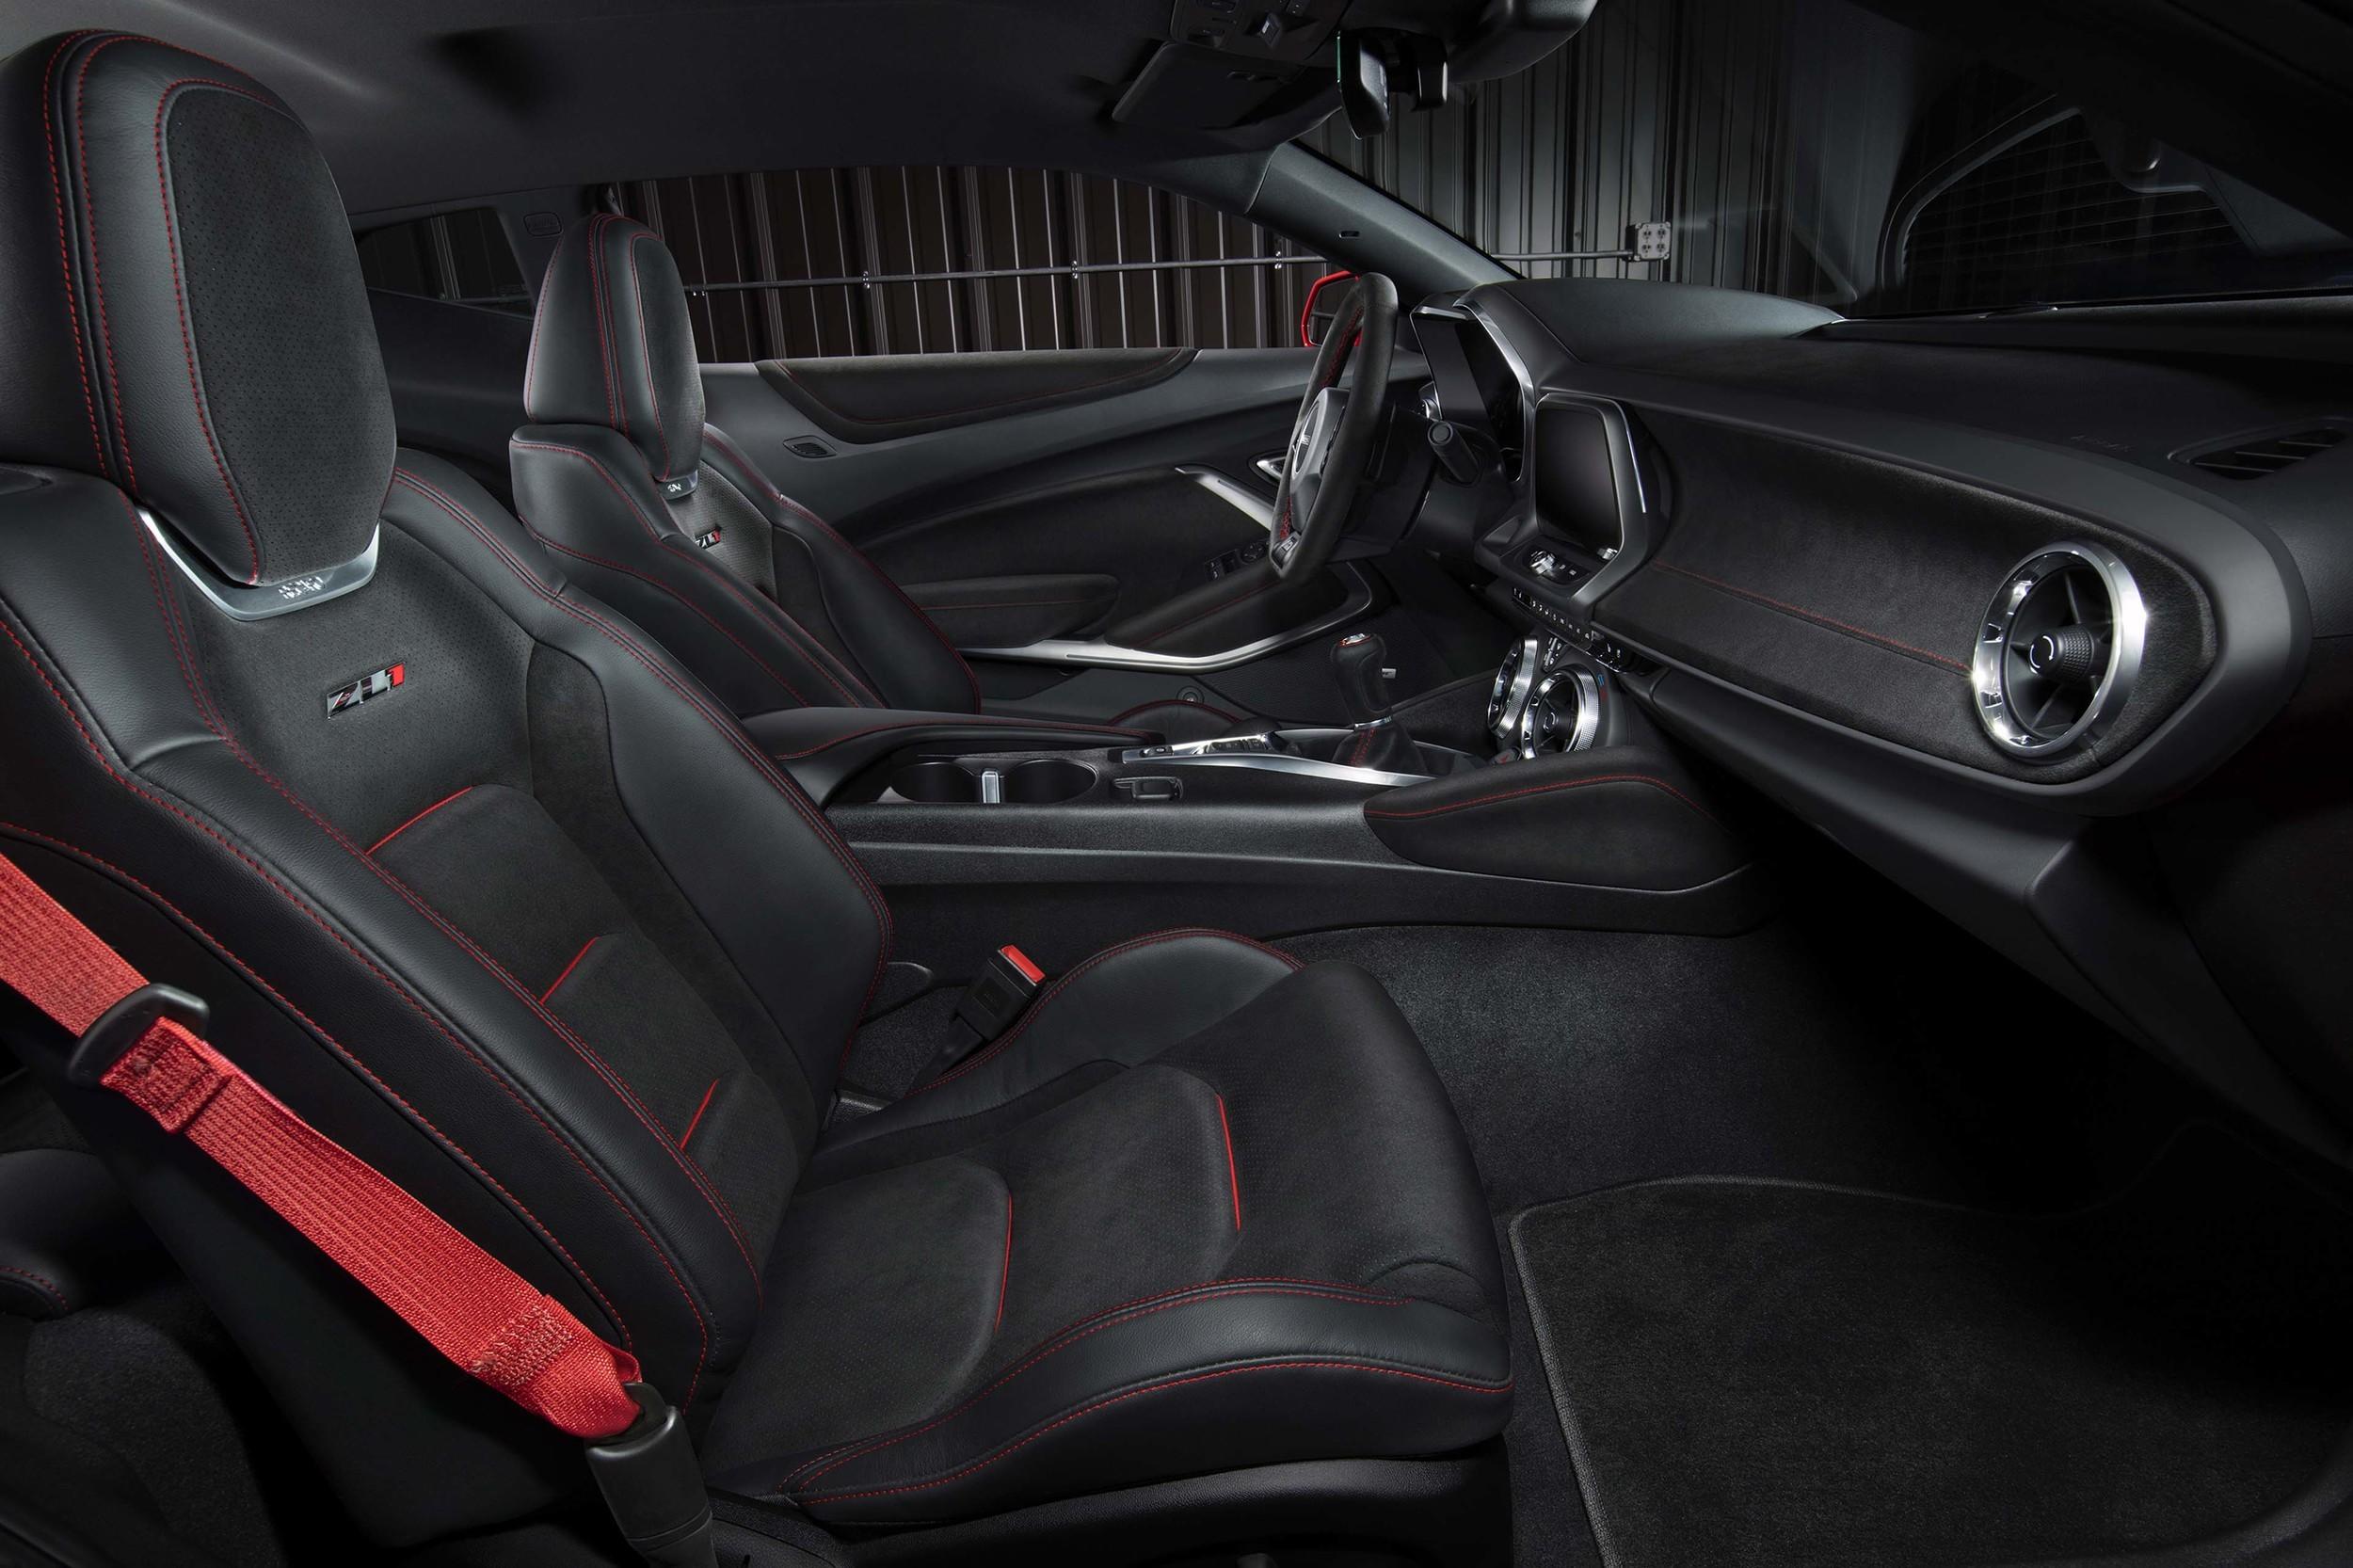 2014 zl1 camaro recaro seats html 2017 2018 cars reviews -  2017 Chevrolet Camaro Zl1 Interior